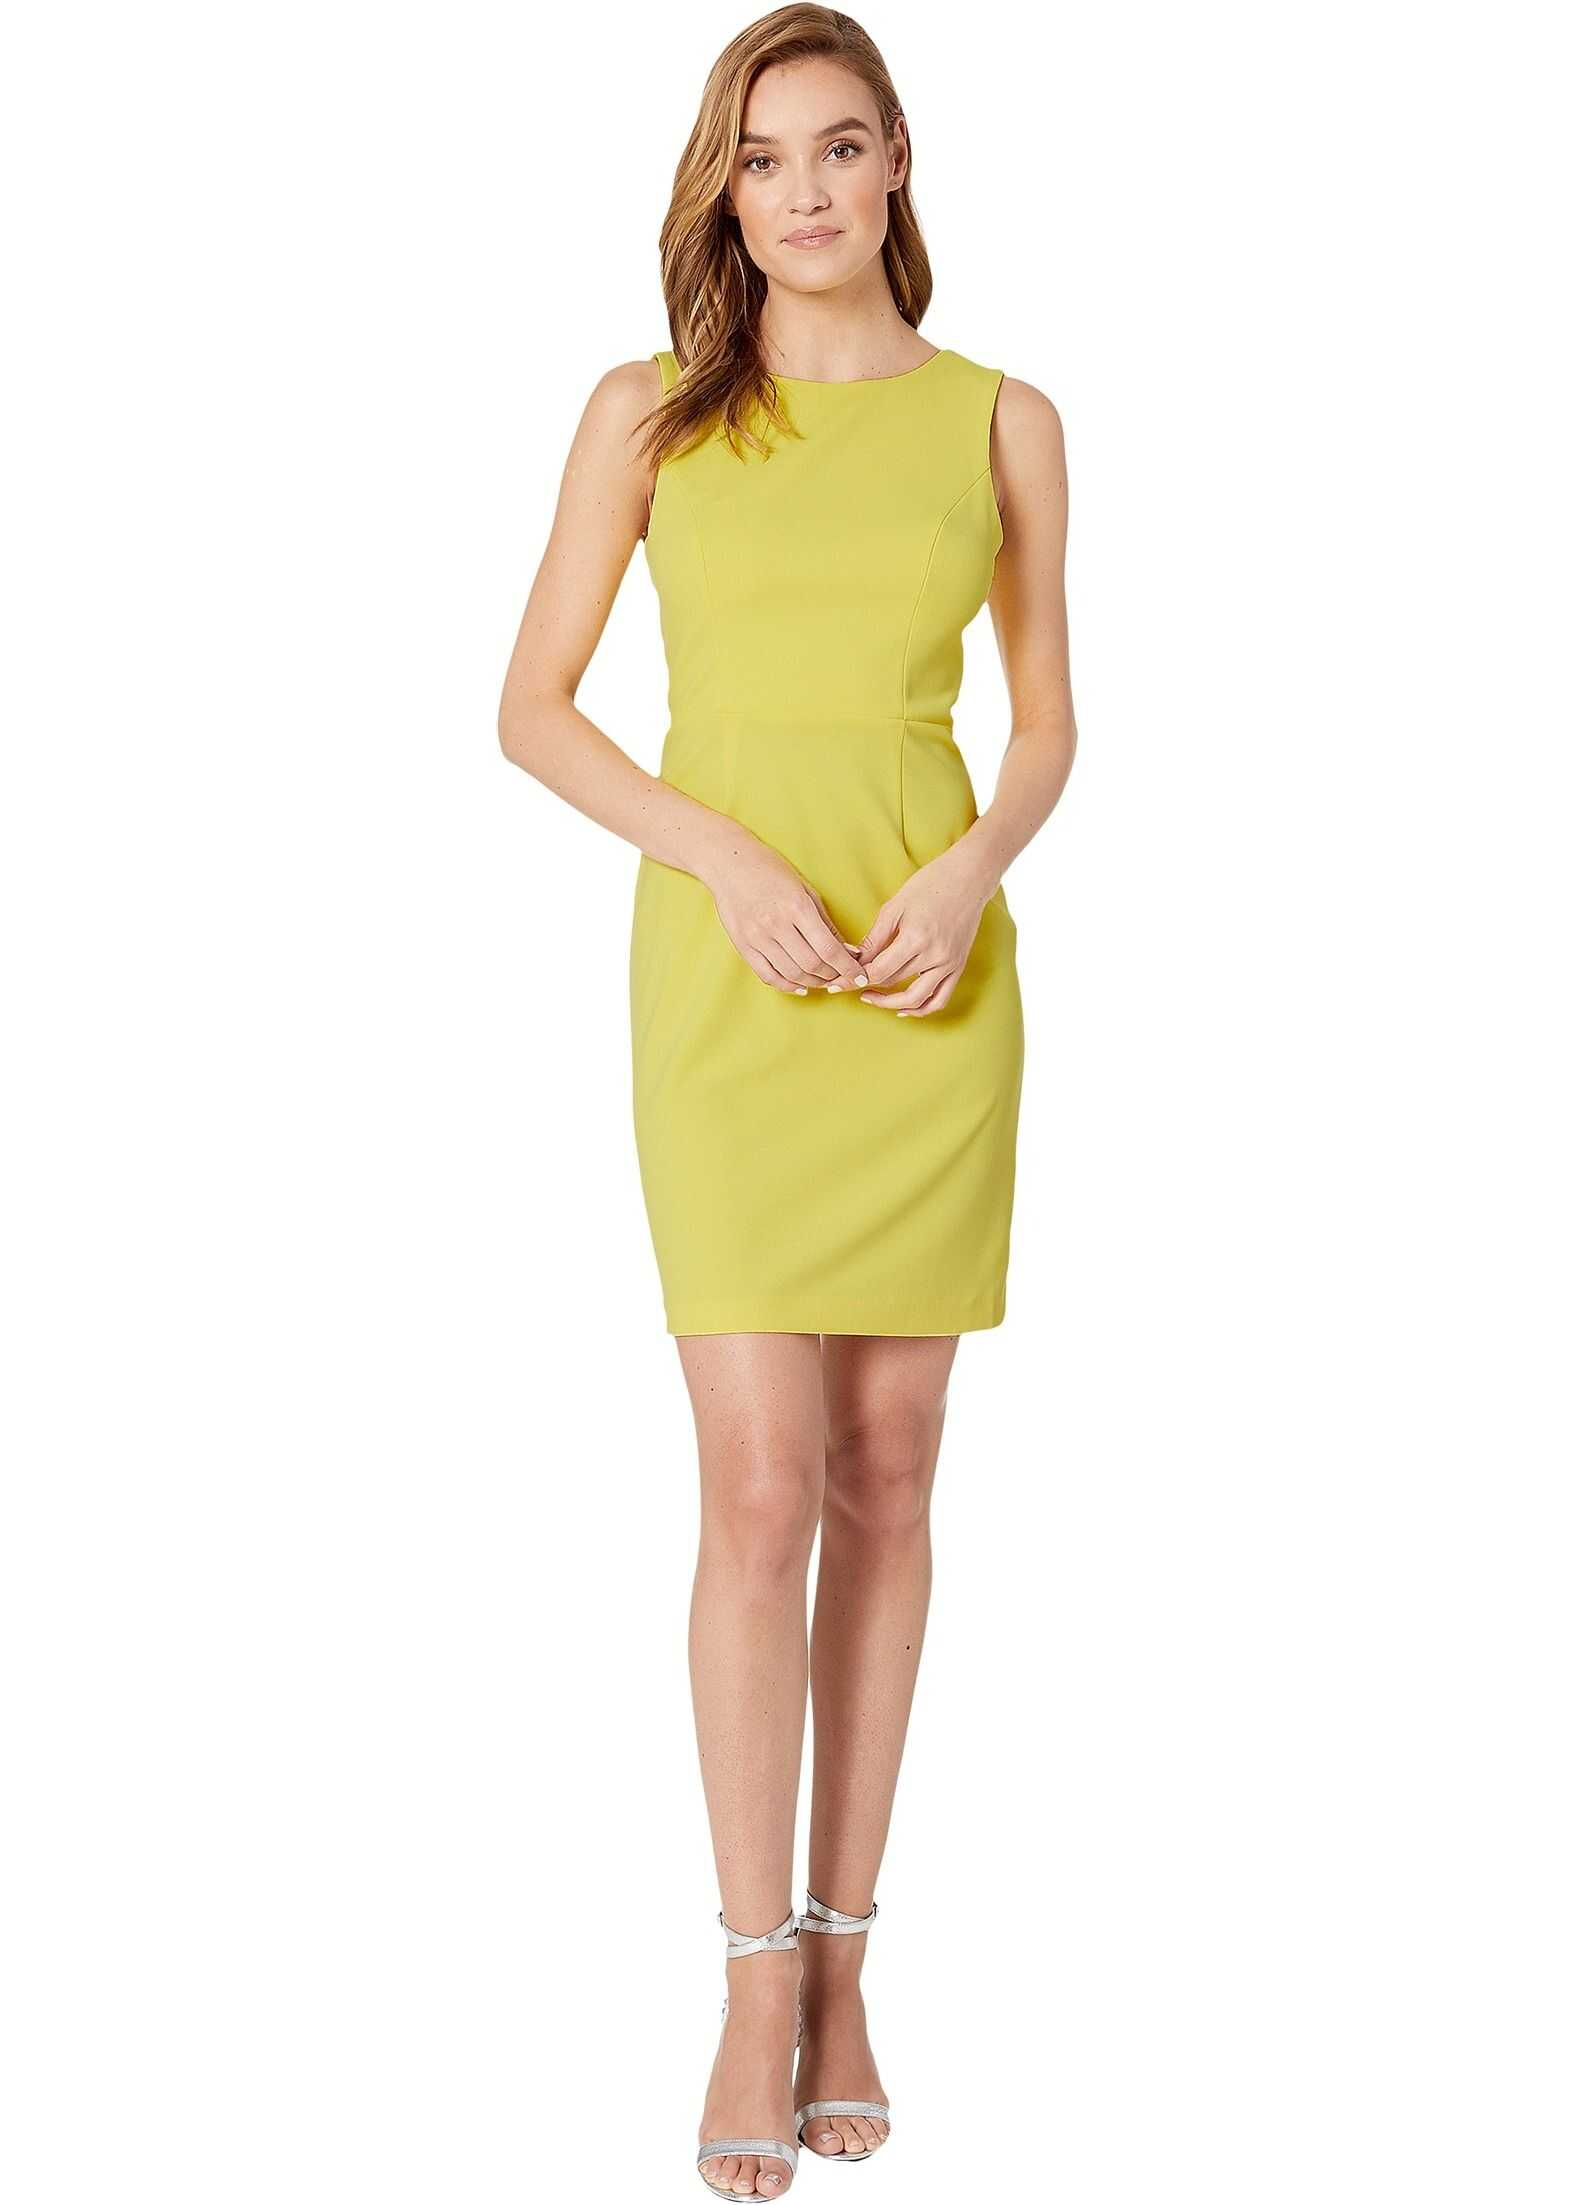 Betsey Johnson Scuba Crepe Cross-Back Dress New Spring Sun